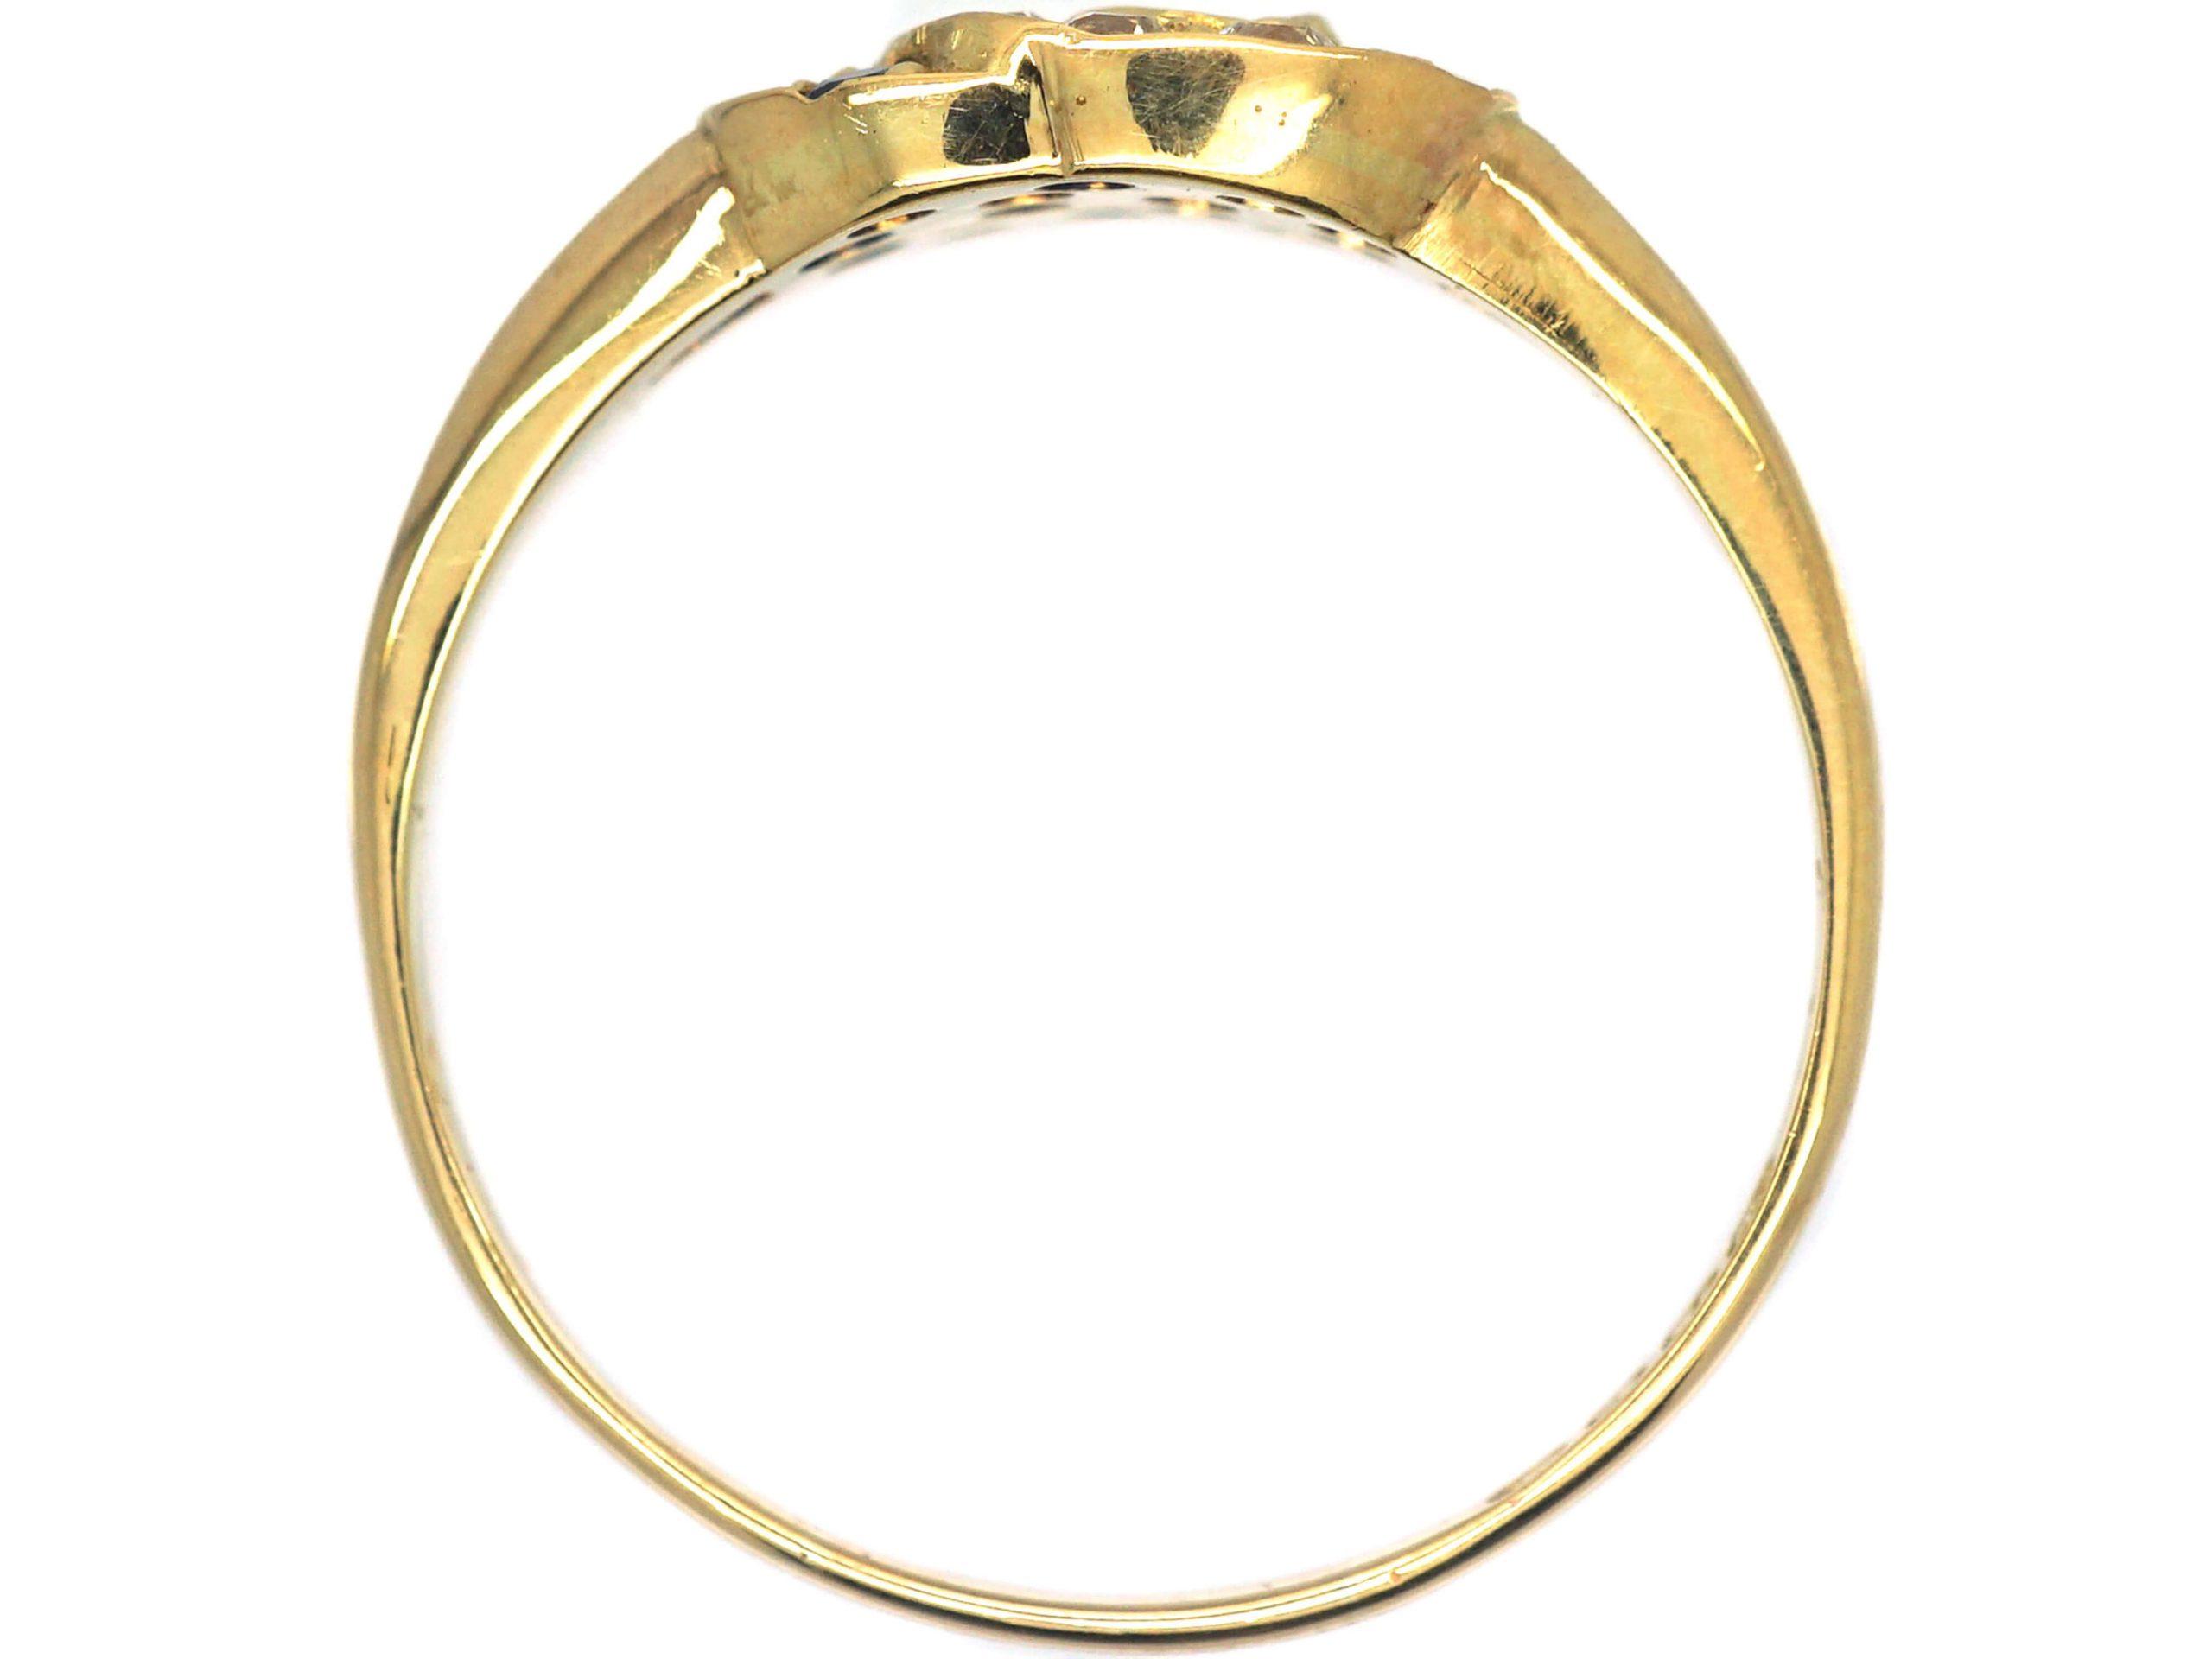 Edwardian 18ct Gold, Interlocking Circles Ring set with Sapphires & Diamonds